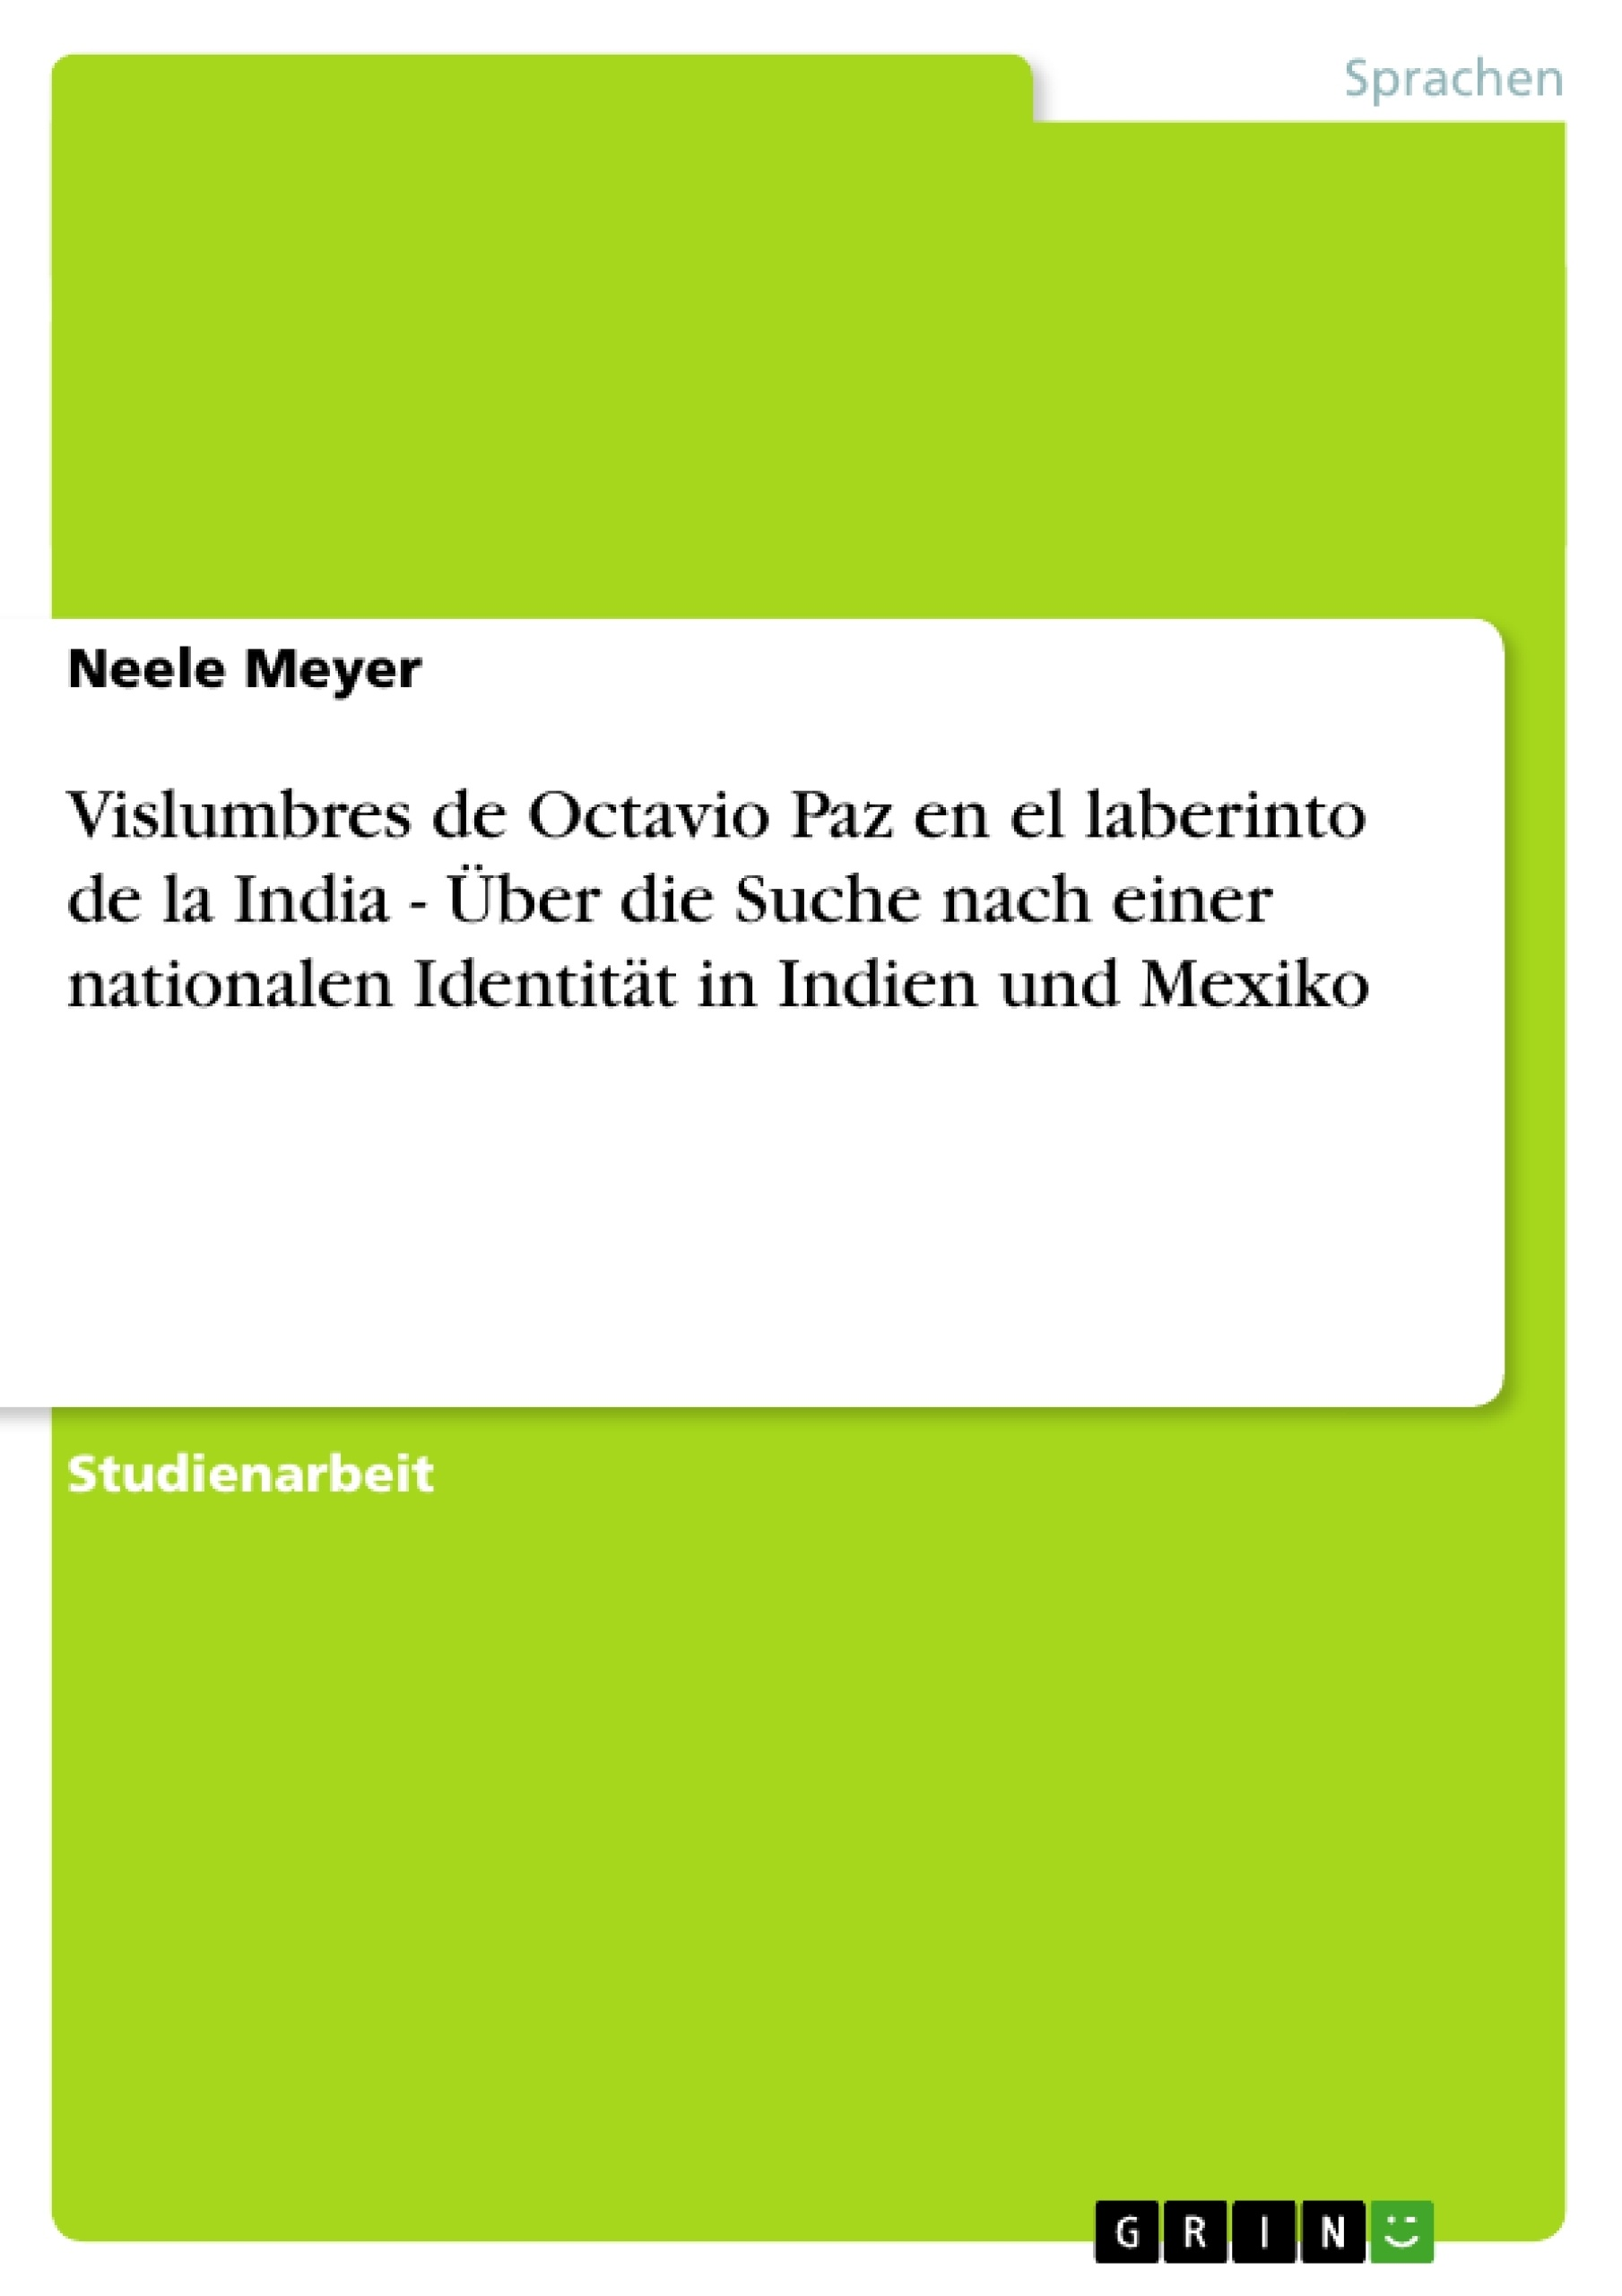 Titel: Vislumbres de Octavio Paz en el laberinto de la India - Über die Suche nach einer nationalen Identität in Indien und Mexiko